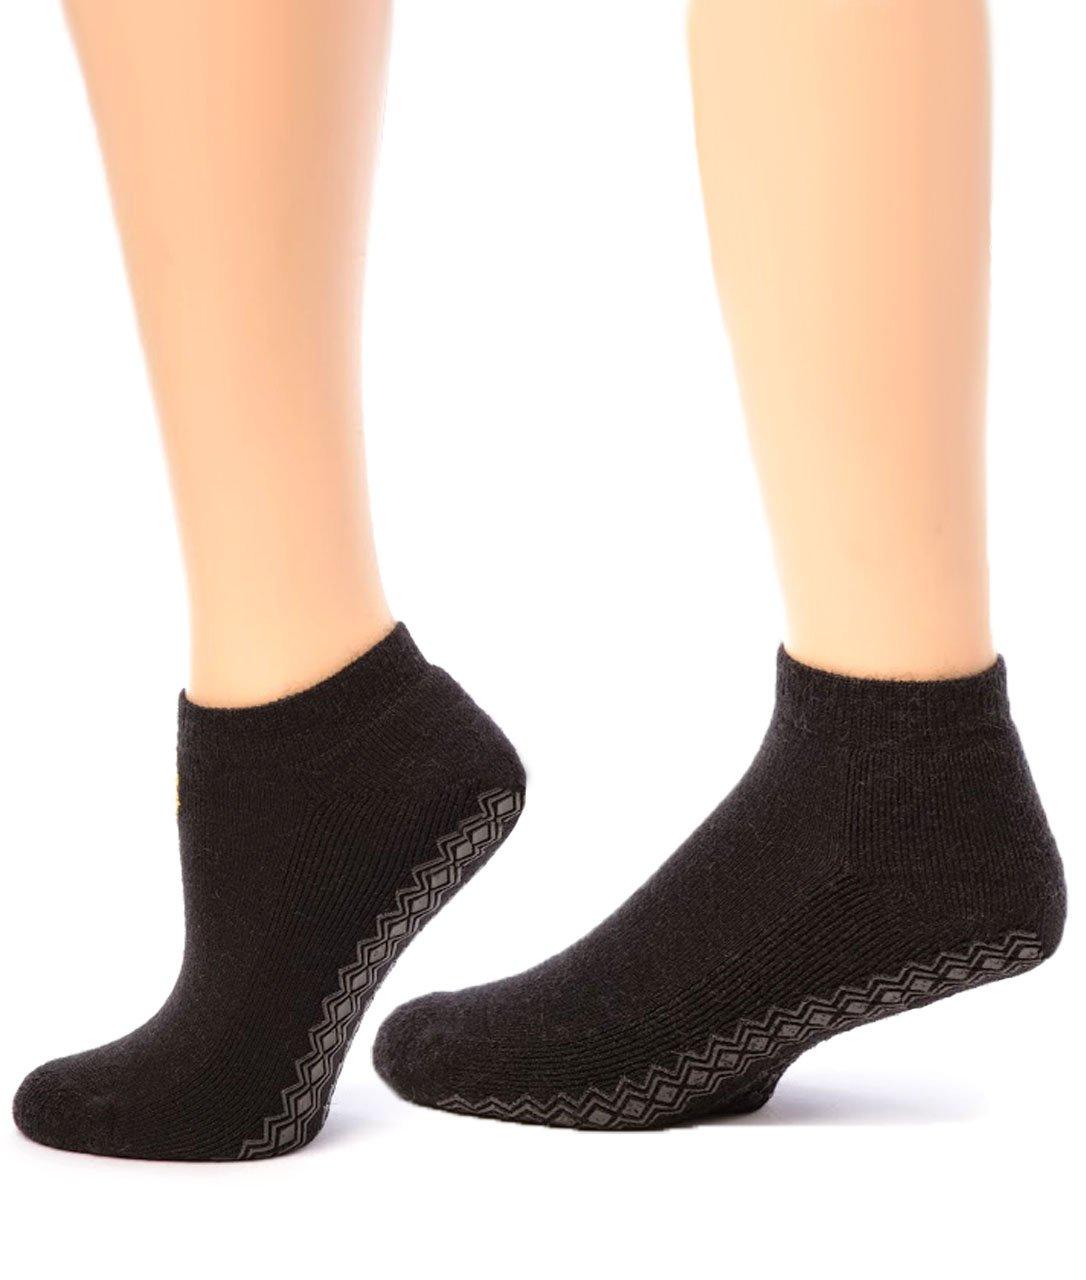 Warrior Alpaca Socks - Boy's Non-Slip Mini Crew Sock Black L